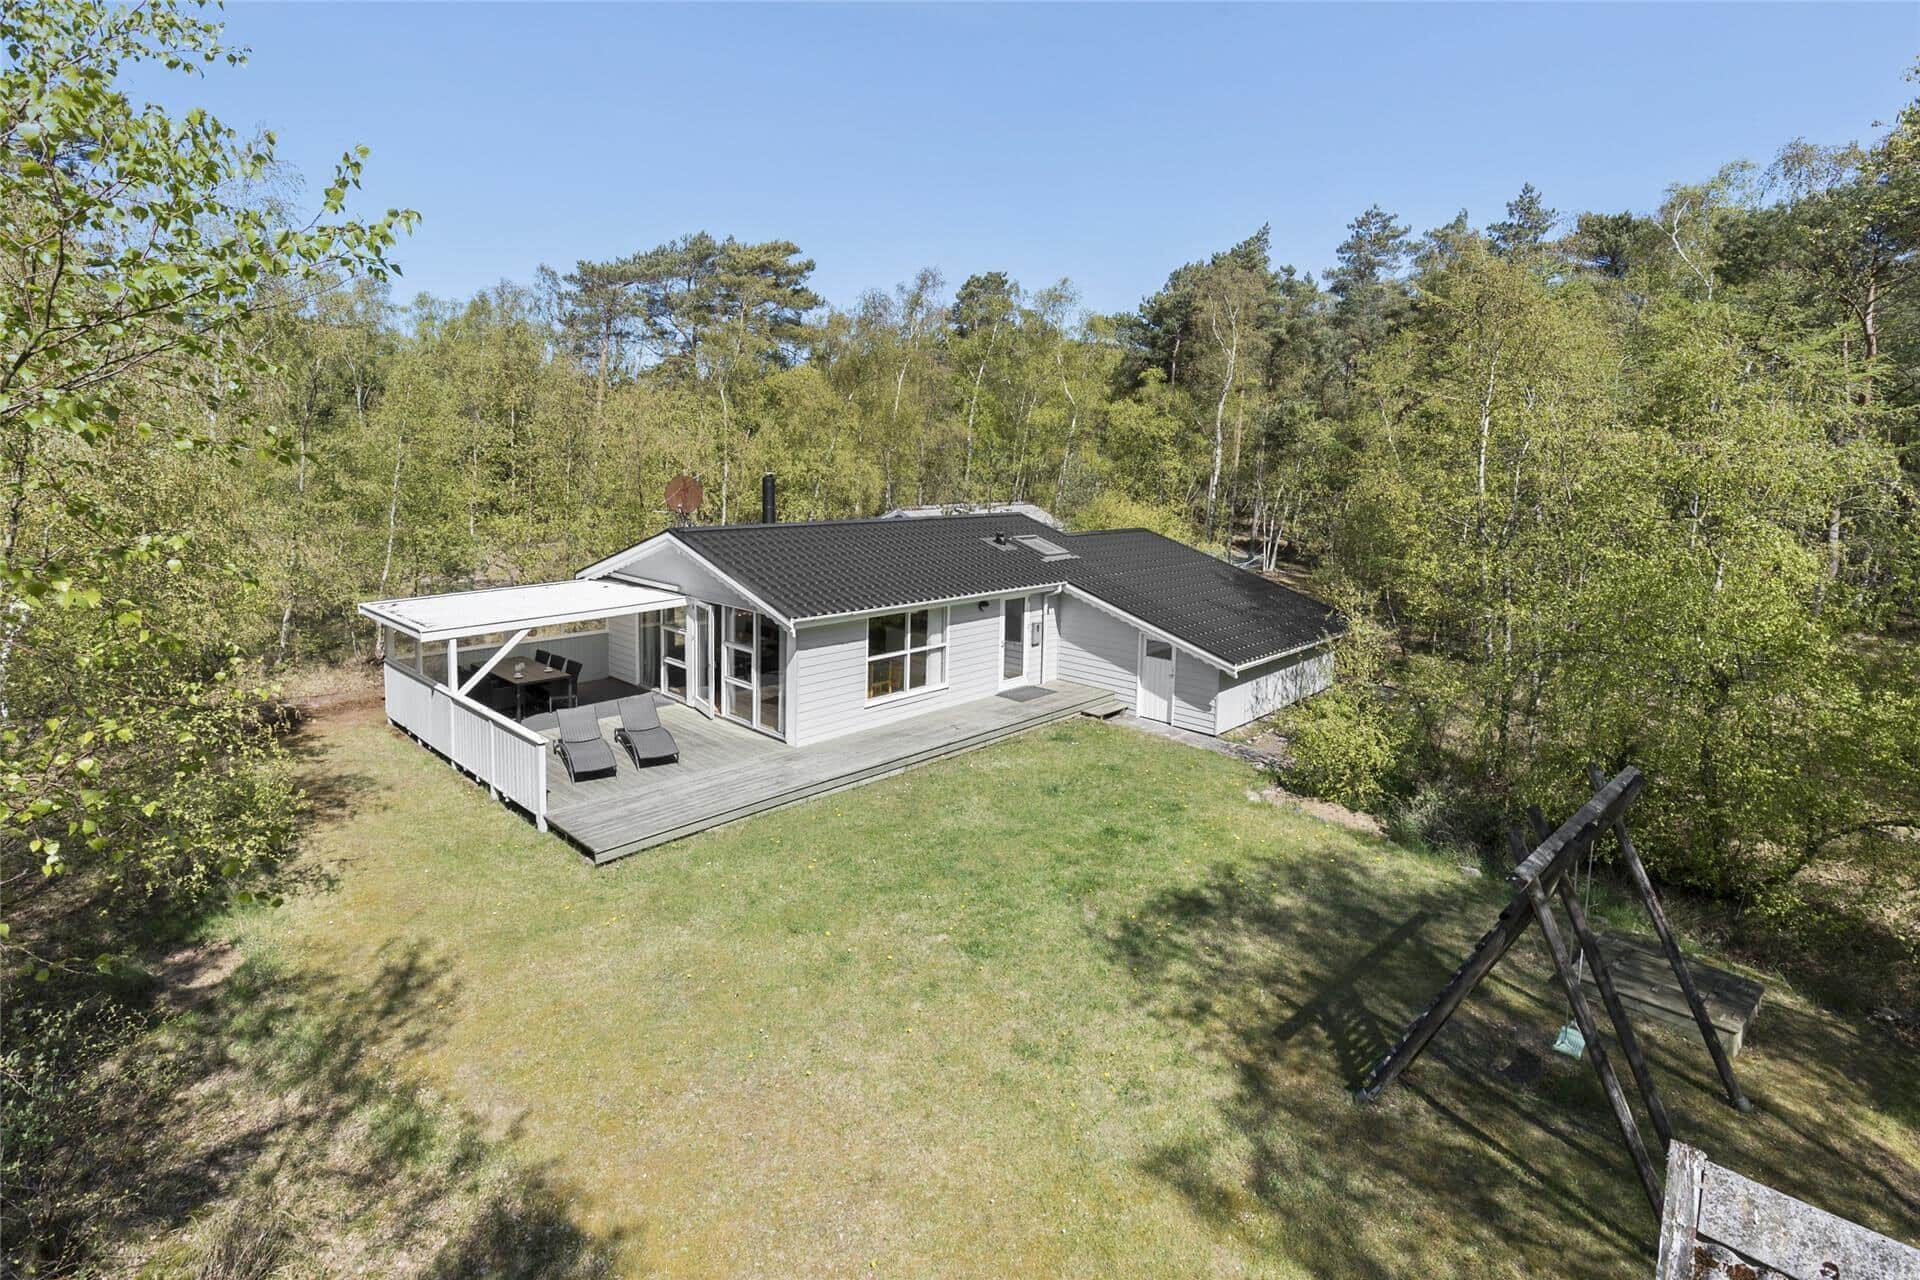 Bild 1-10 Ferienhaus 2684, Strandbyskoven 9, DK - 3730 Nexø